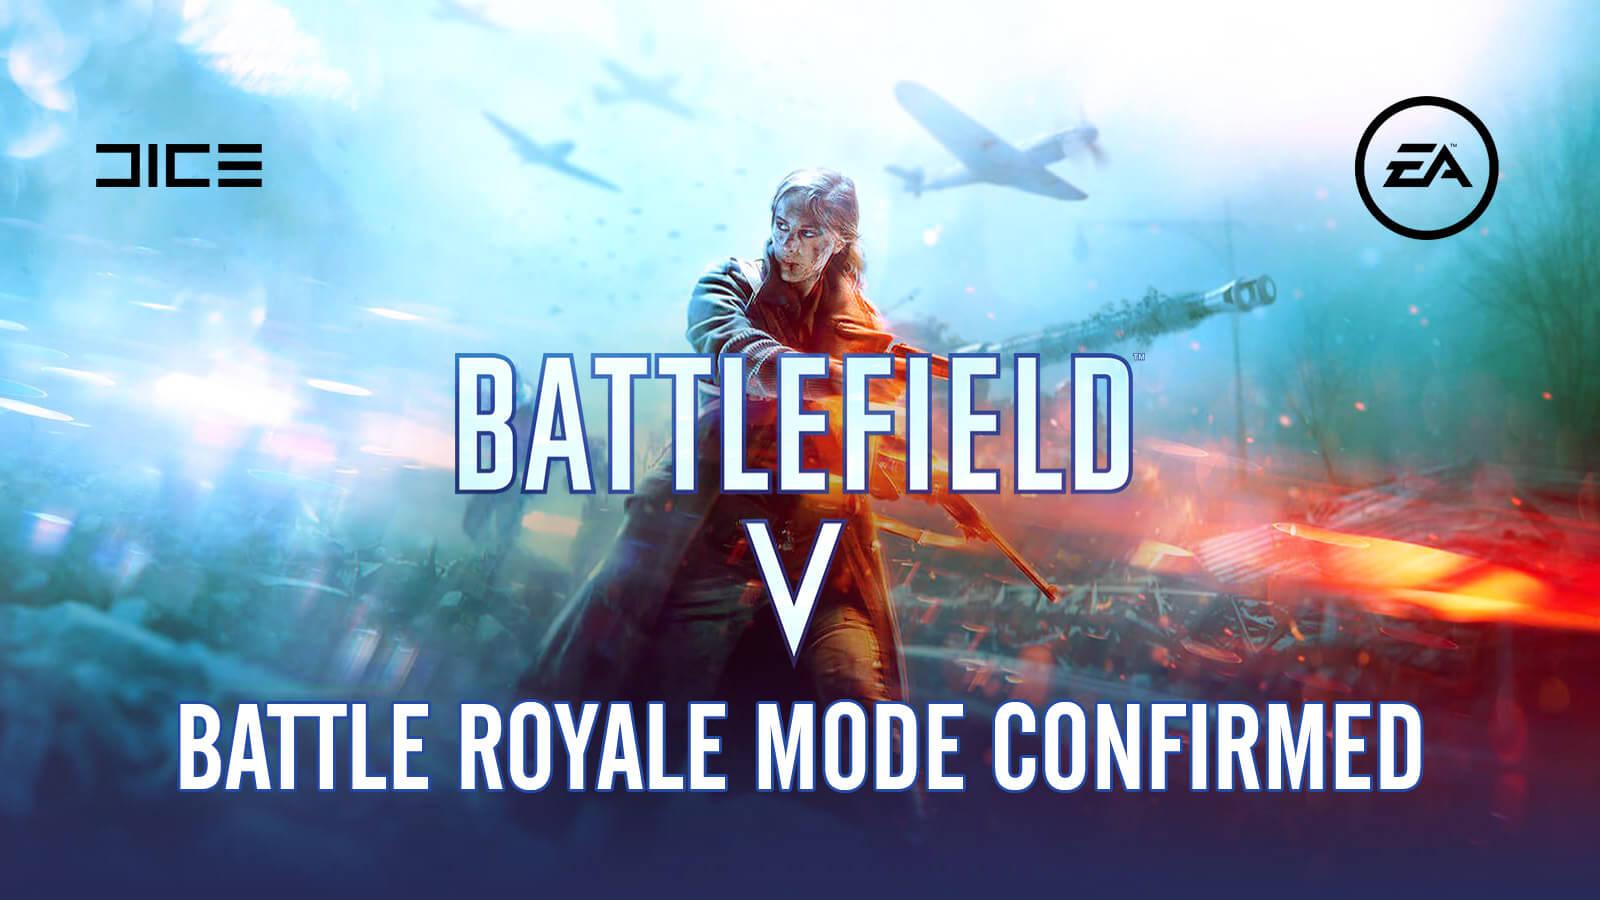 Battle Royale Battlefield V- EA Has Released The New Trailer